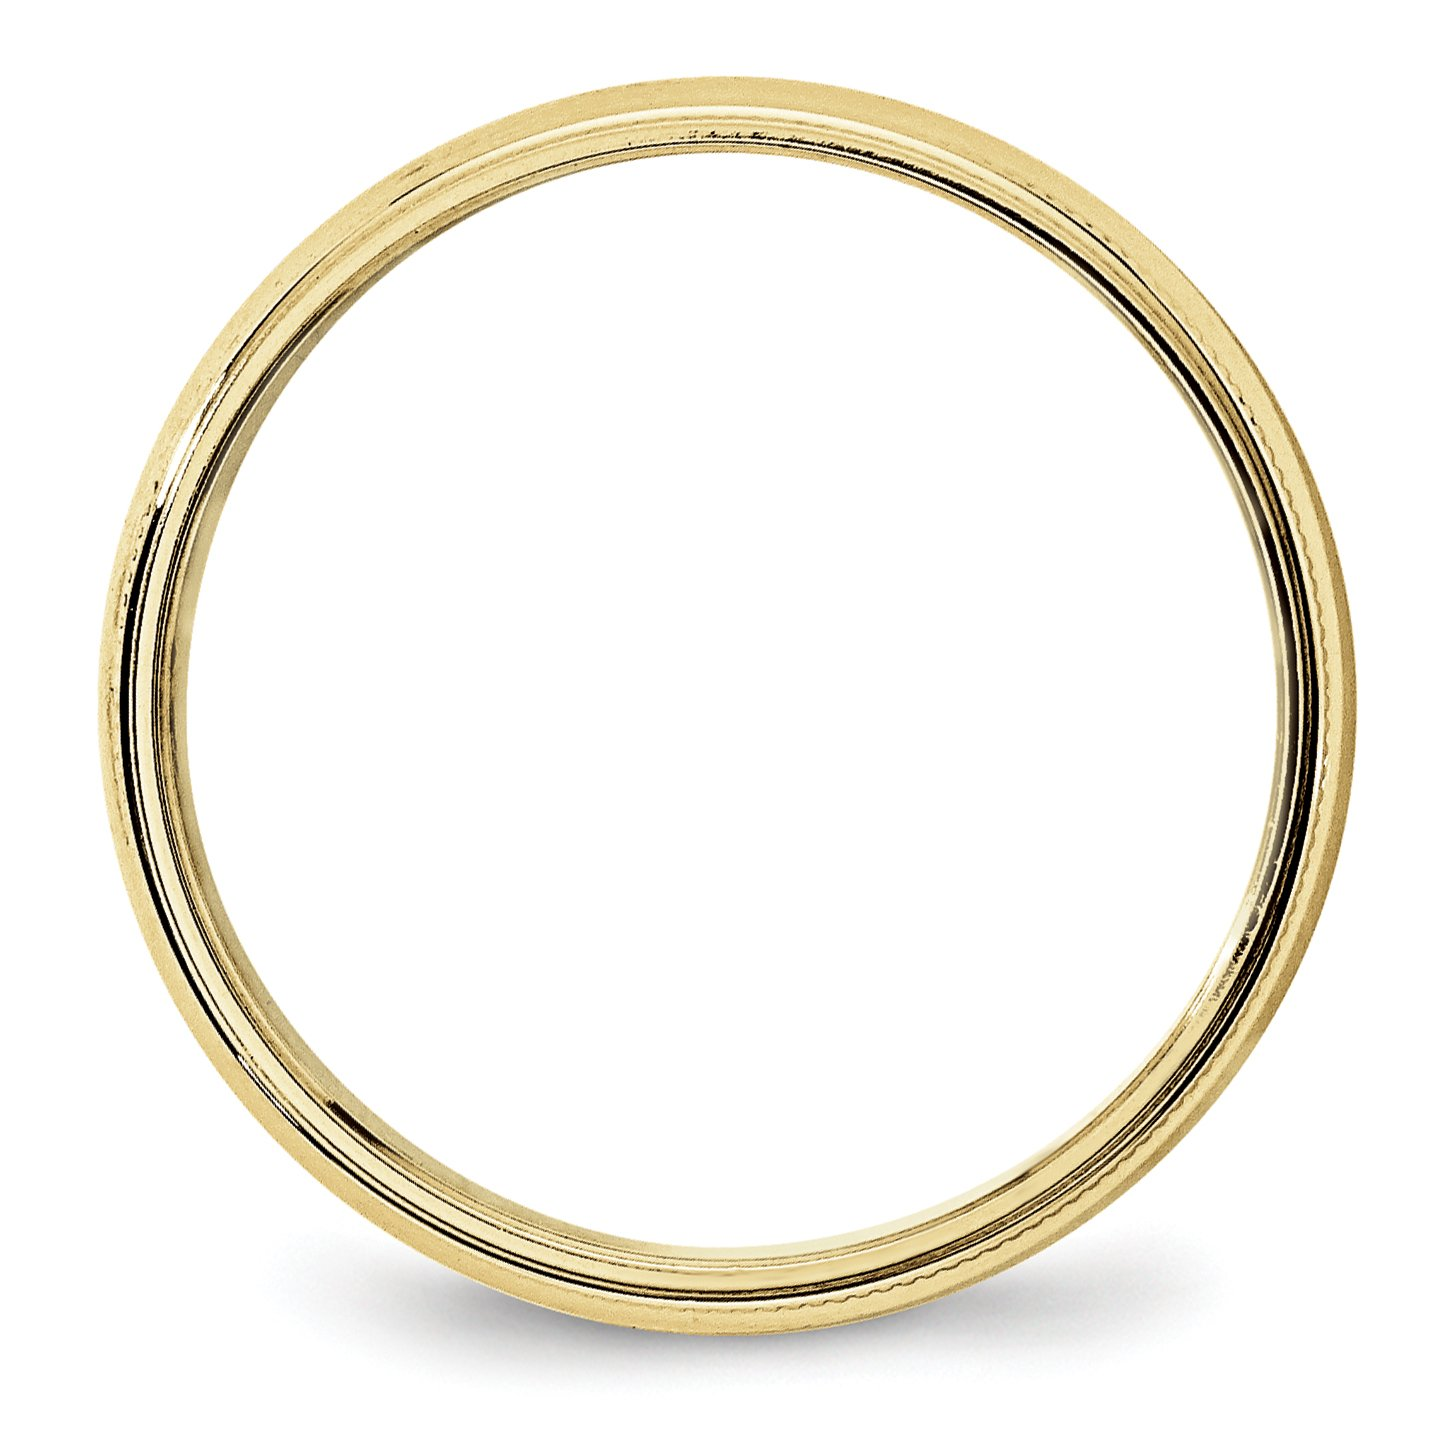 10k Yellow Gold 5mm LTW Milgrain Half Round Wedding Band Fine Jewelry Ideal Gifts For Women